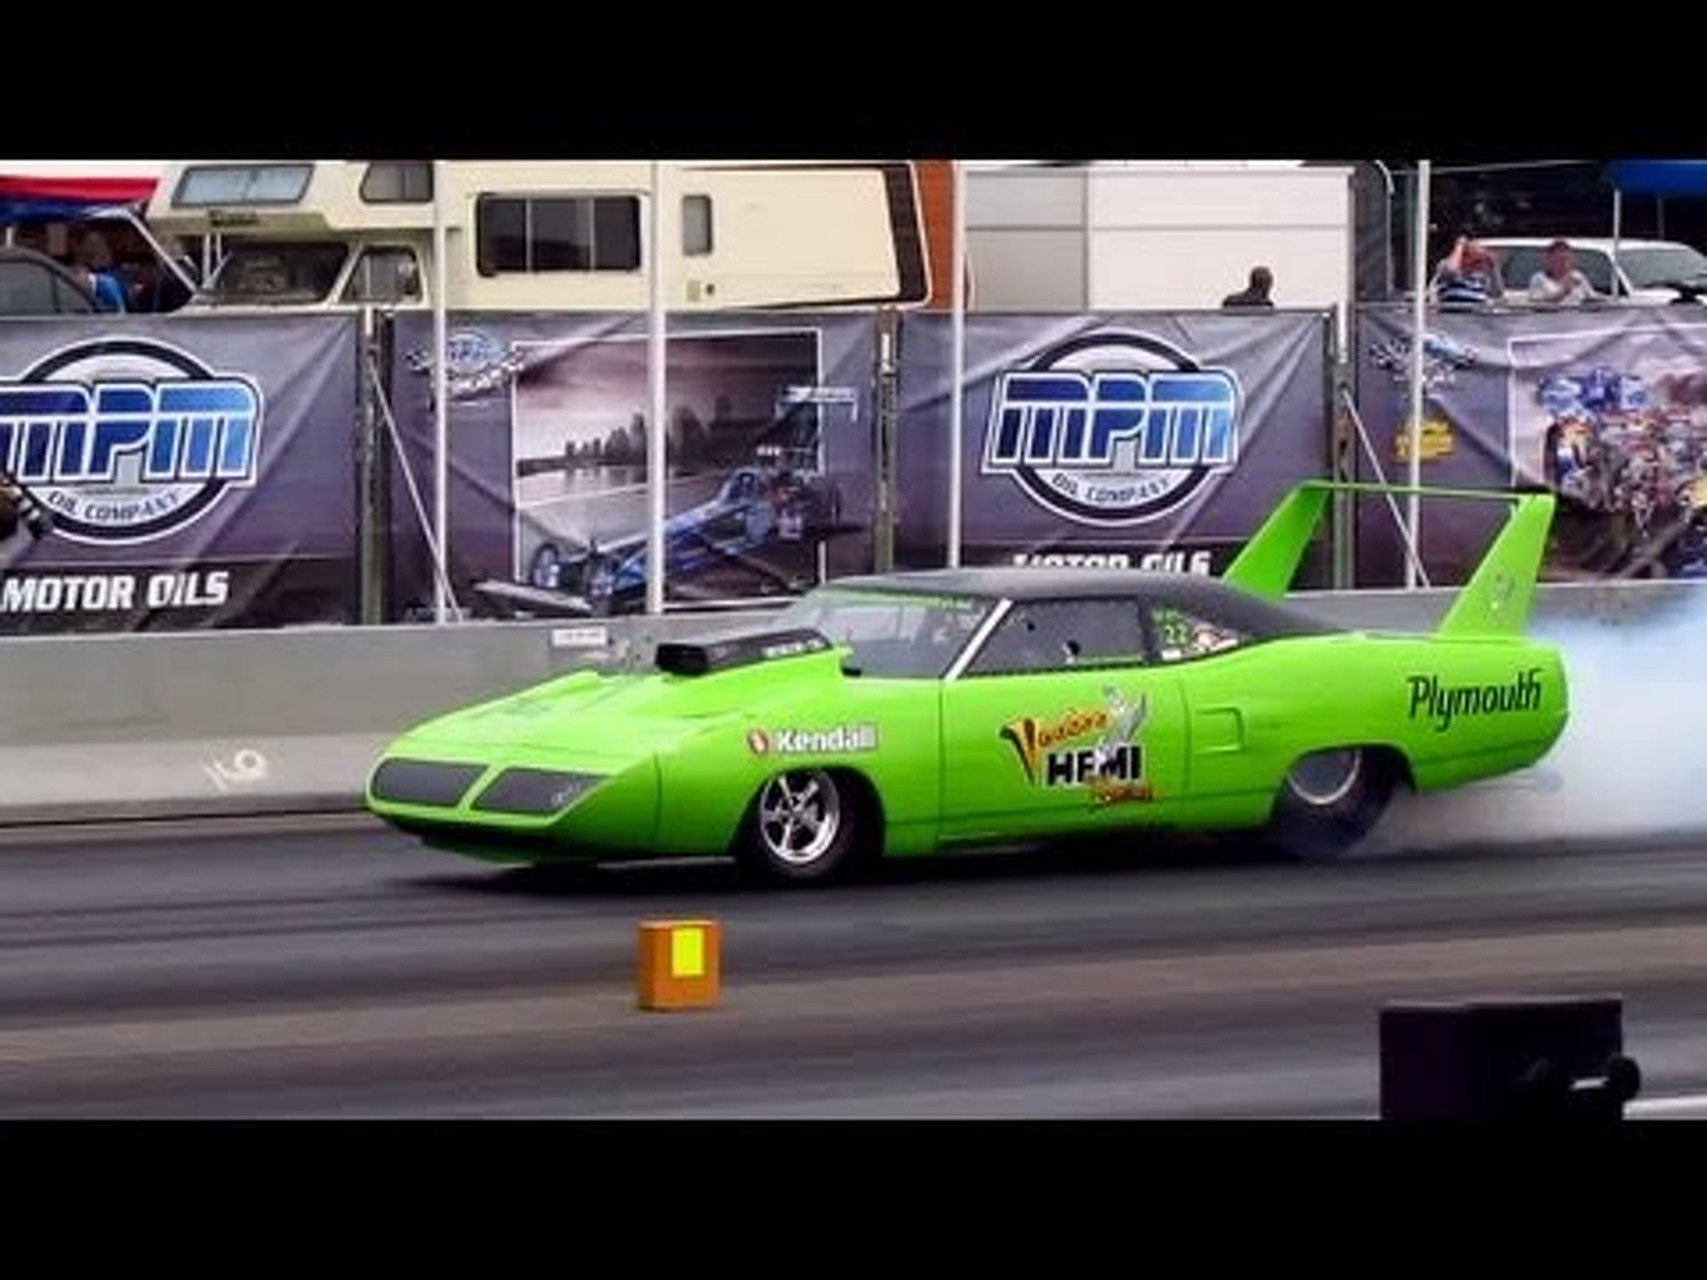 Plymouth Roadrunner Superbird dragster MASSIVE BURNOUT @ Dragracing Drachten 2011 [720p HD]